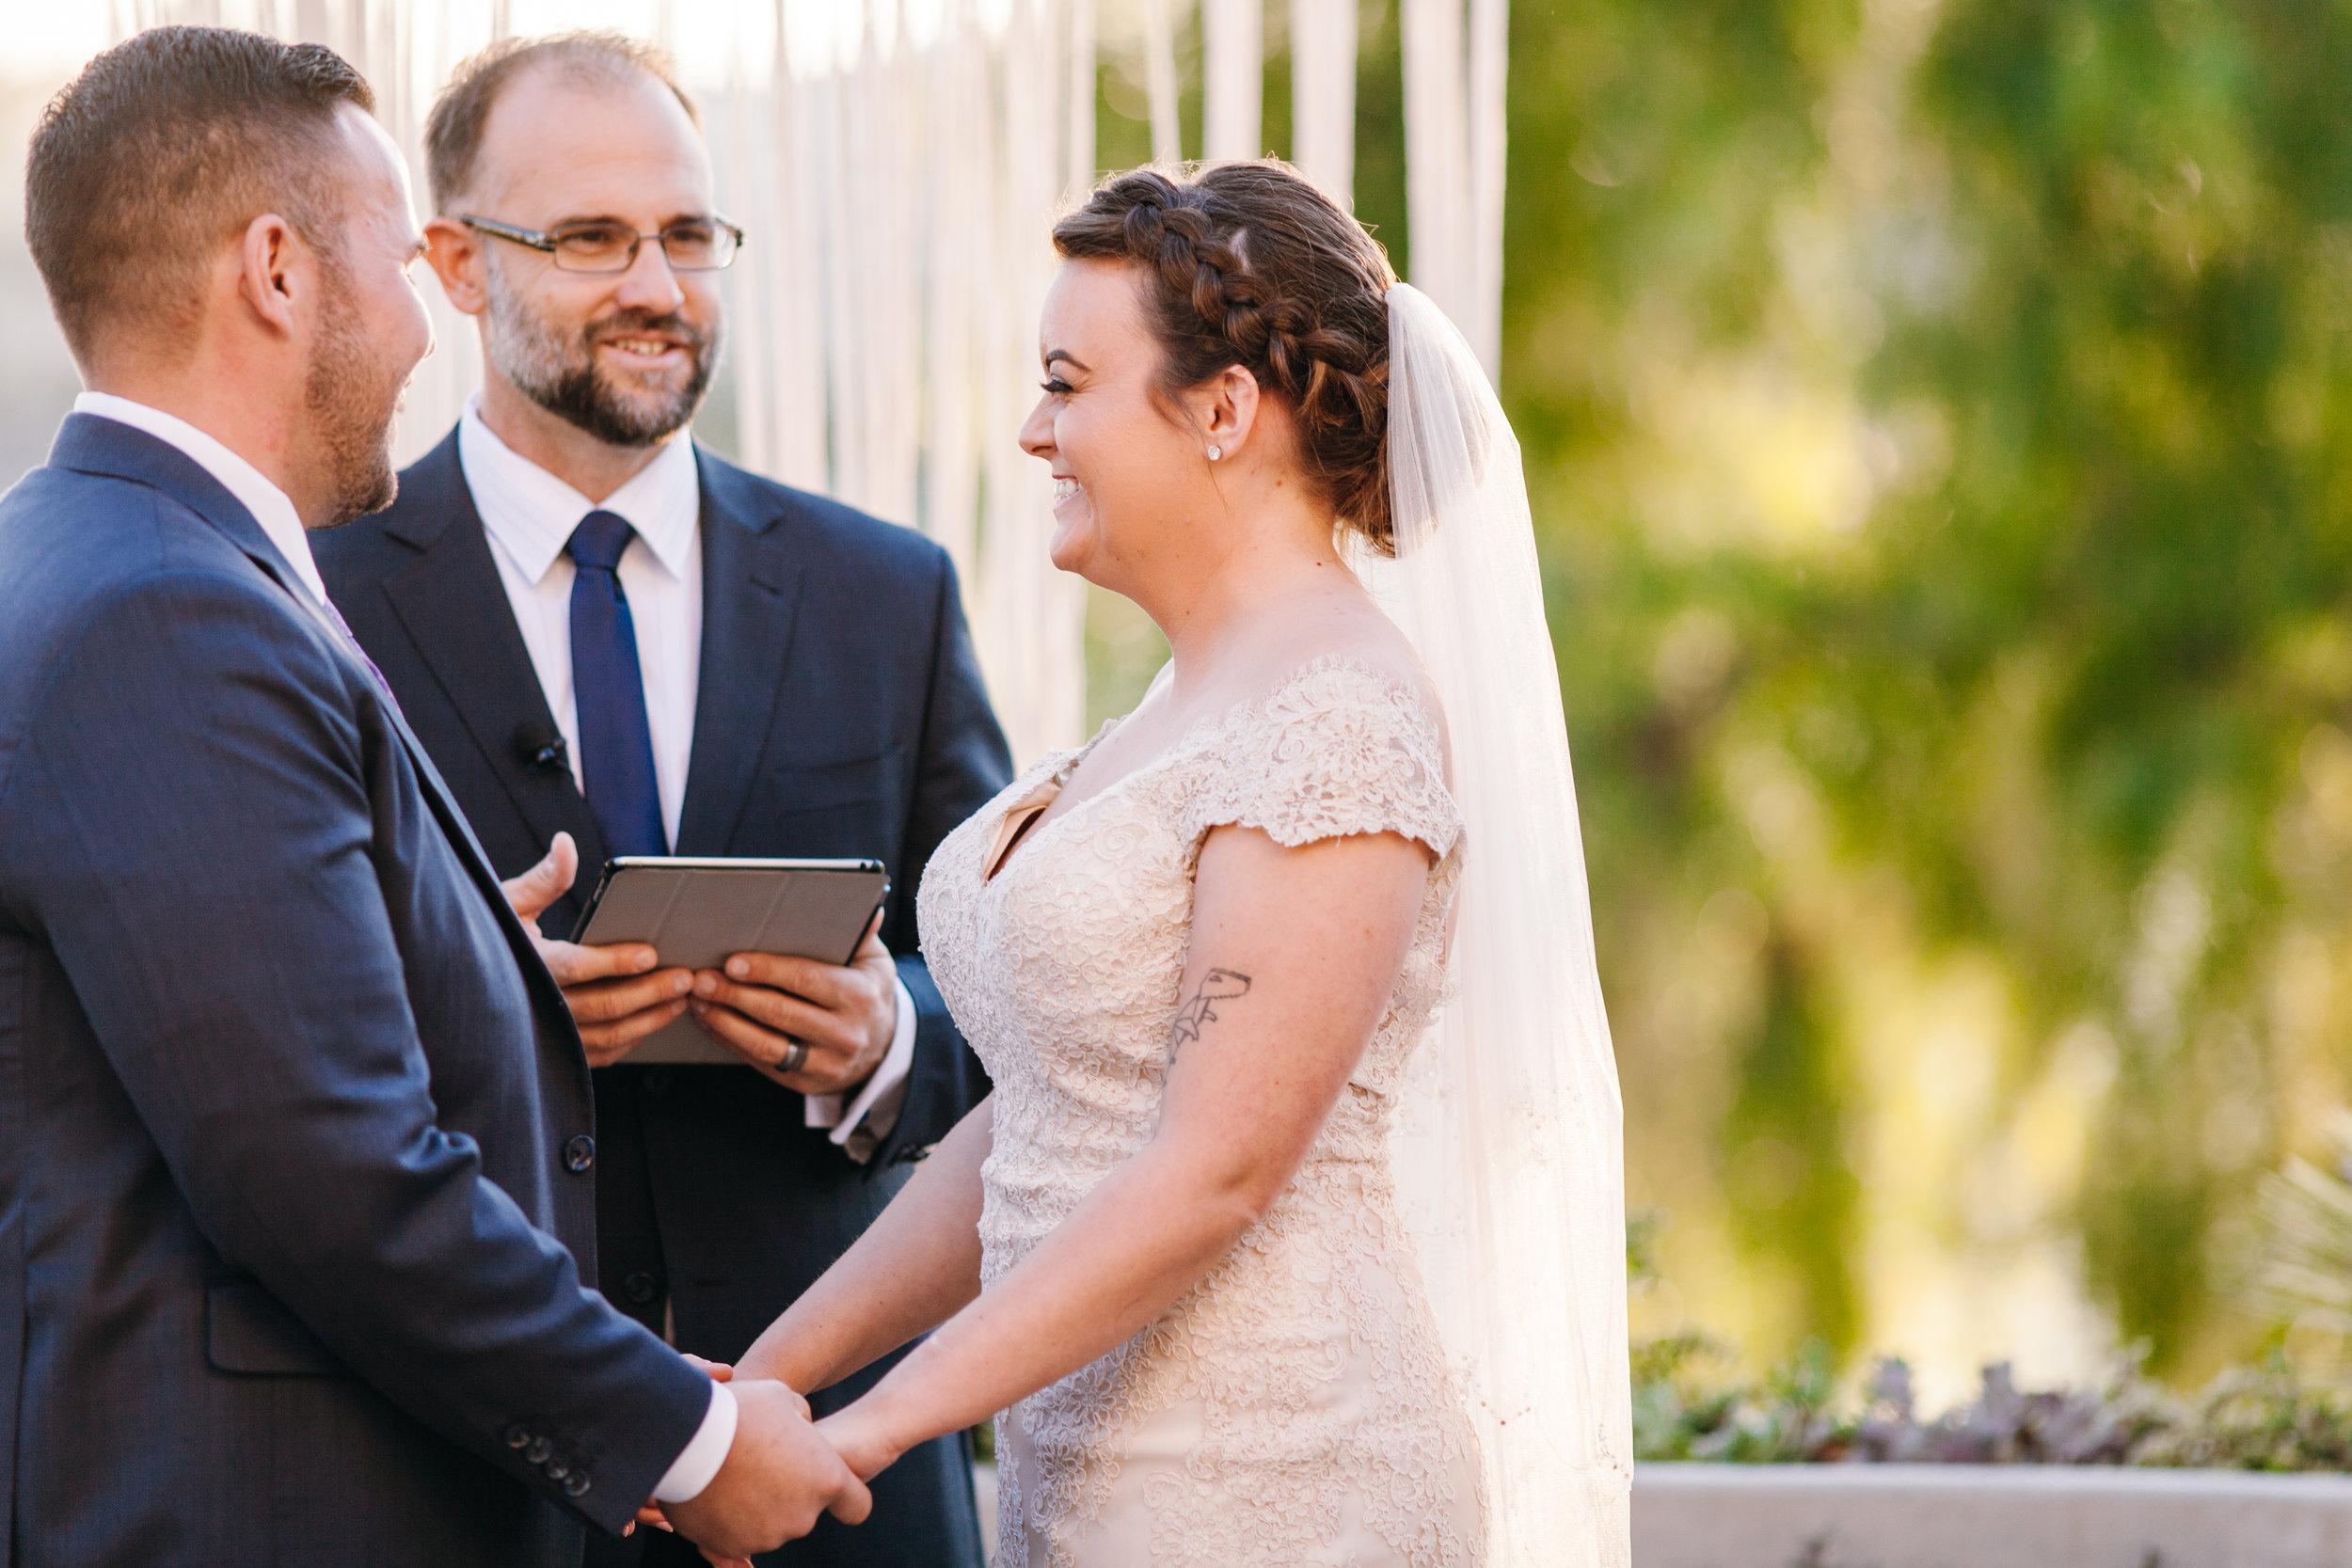 KaraNixonWeddings-DanaPoint-Wedding-ceremony.jpg